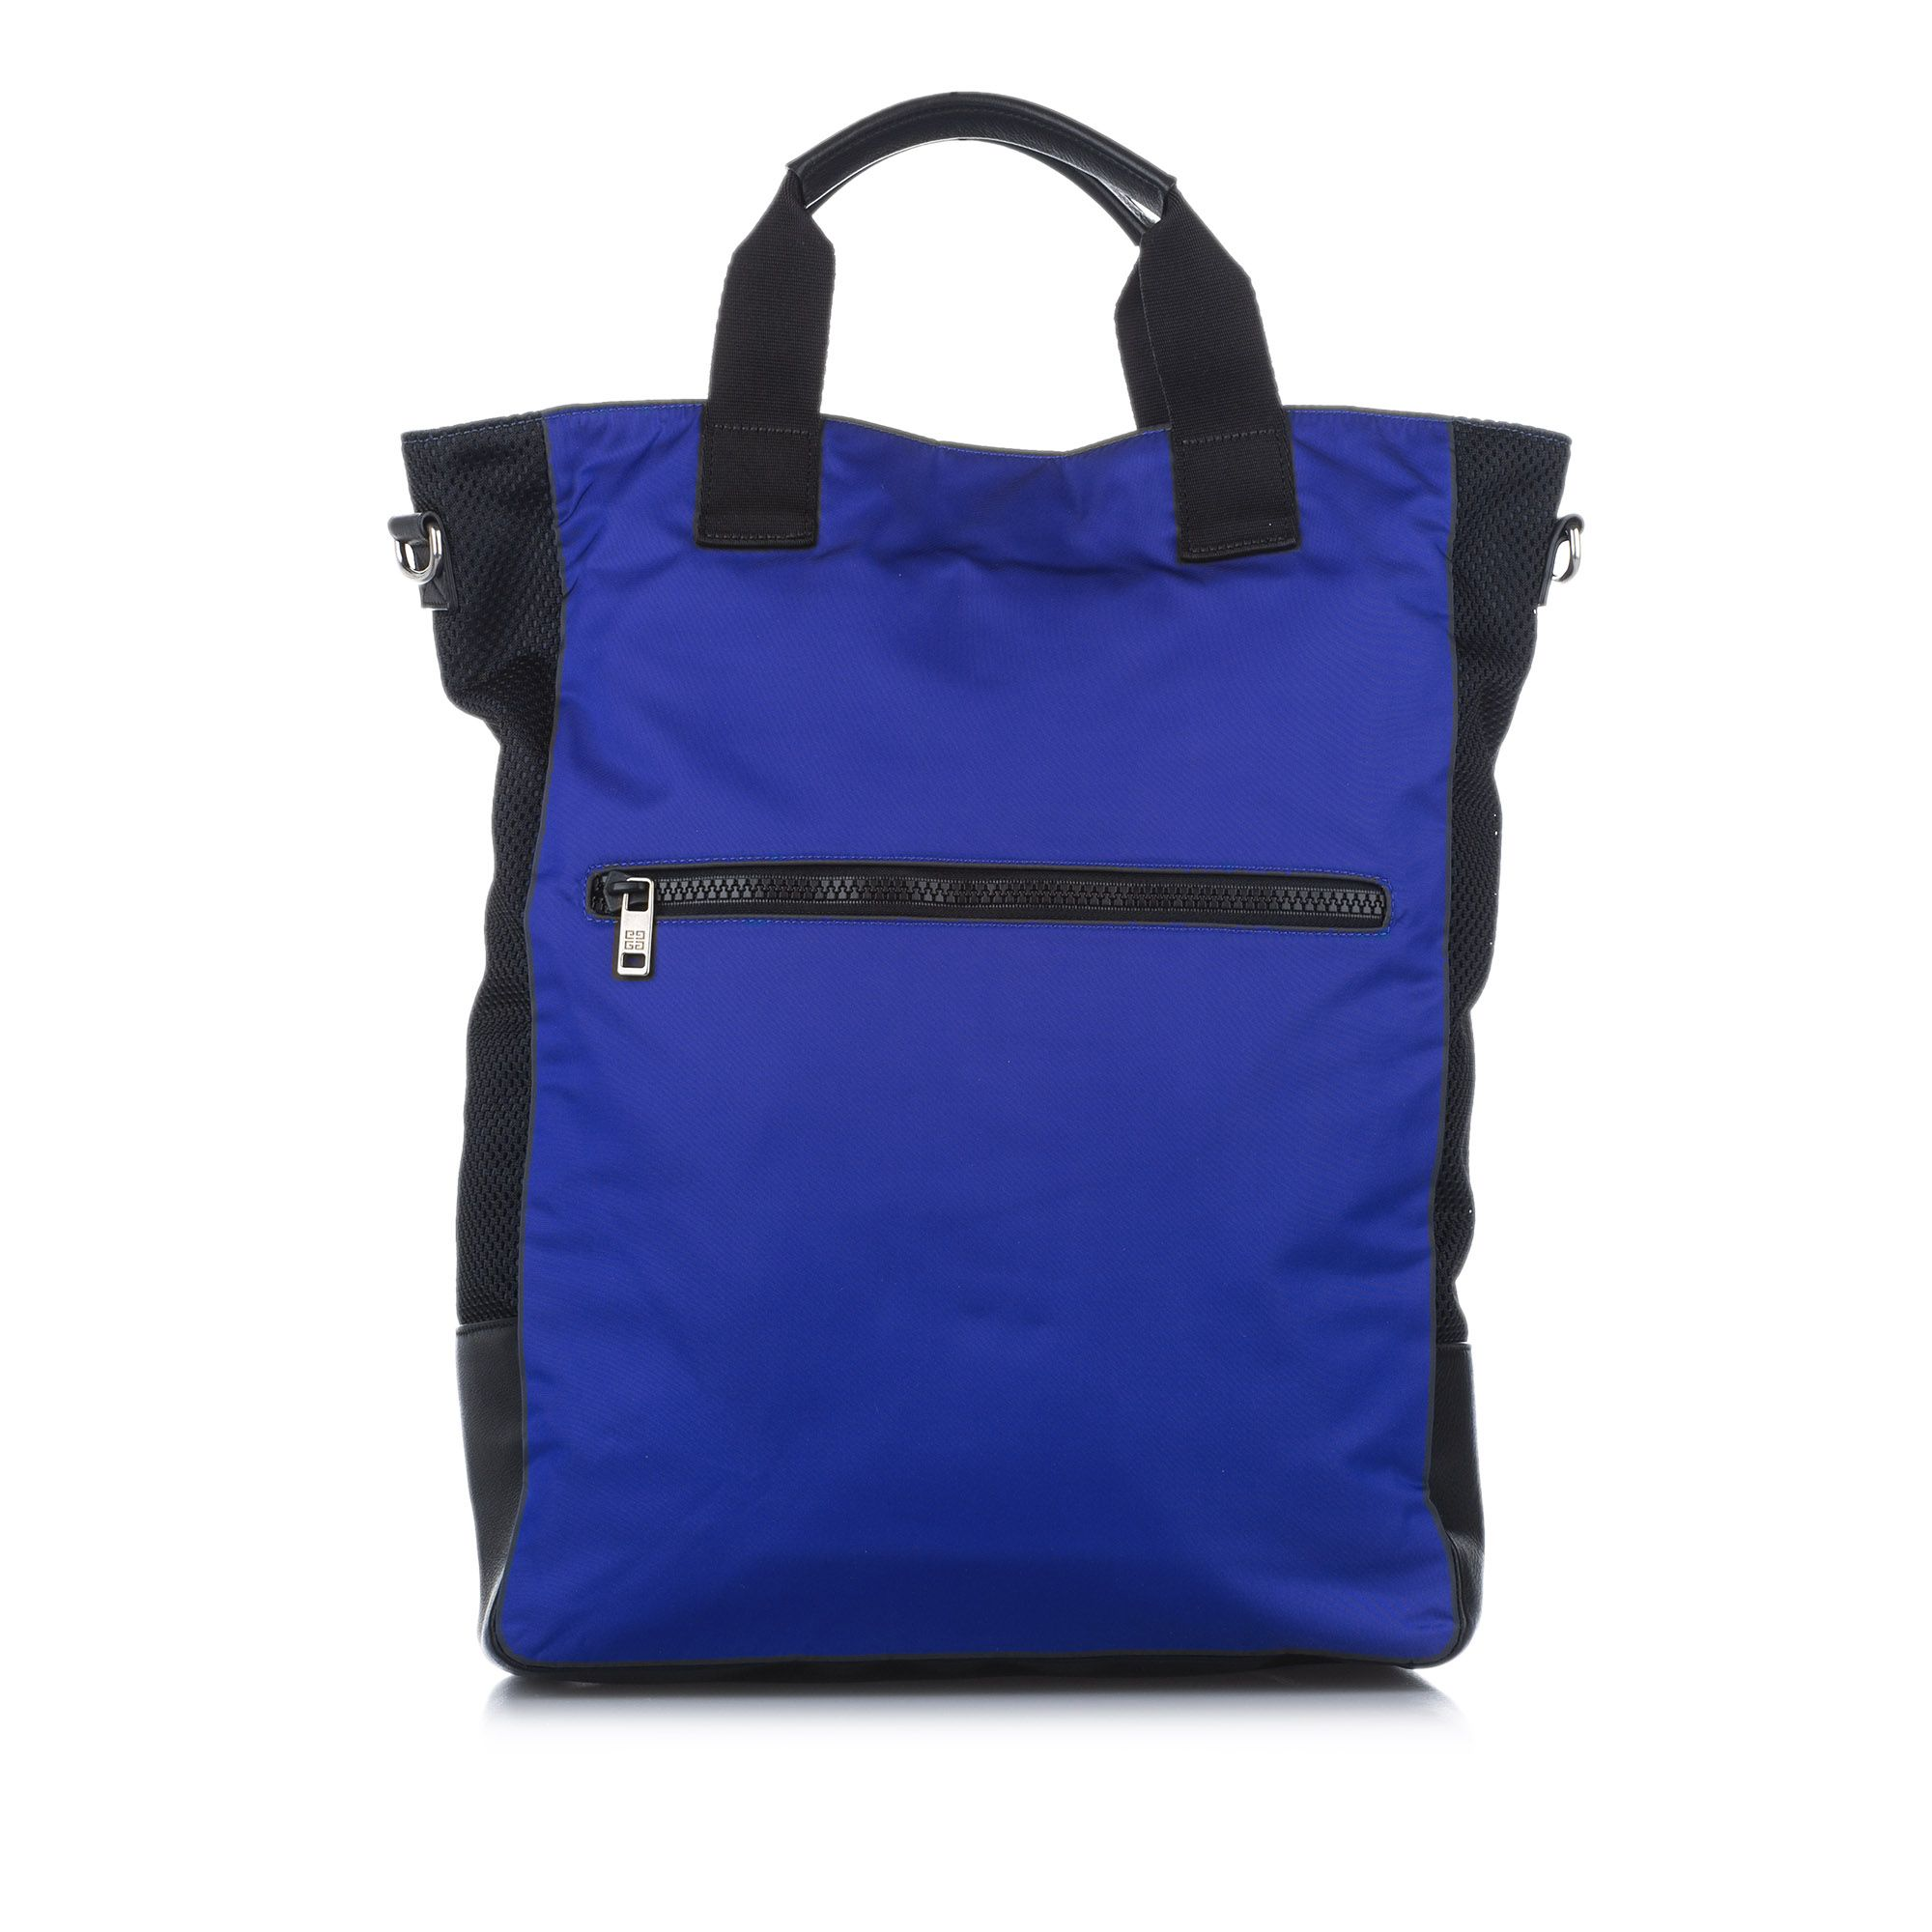 Vintage Givenchy UT3 Nylon Tote Bag Blue